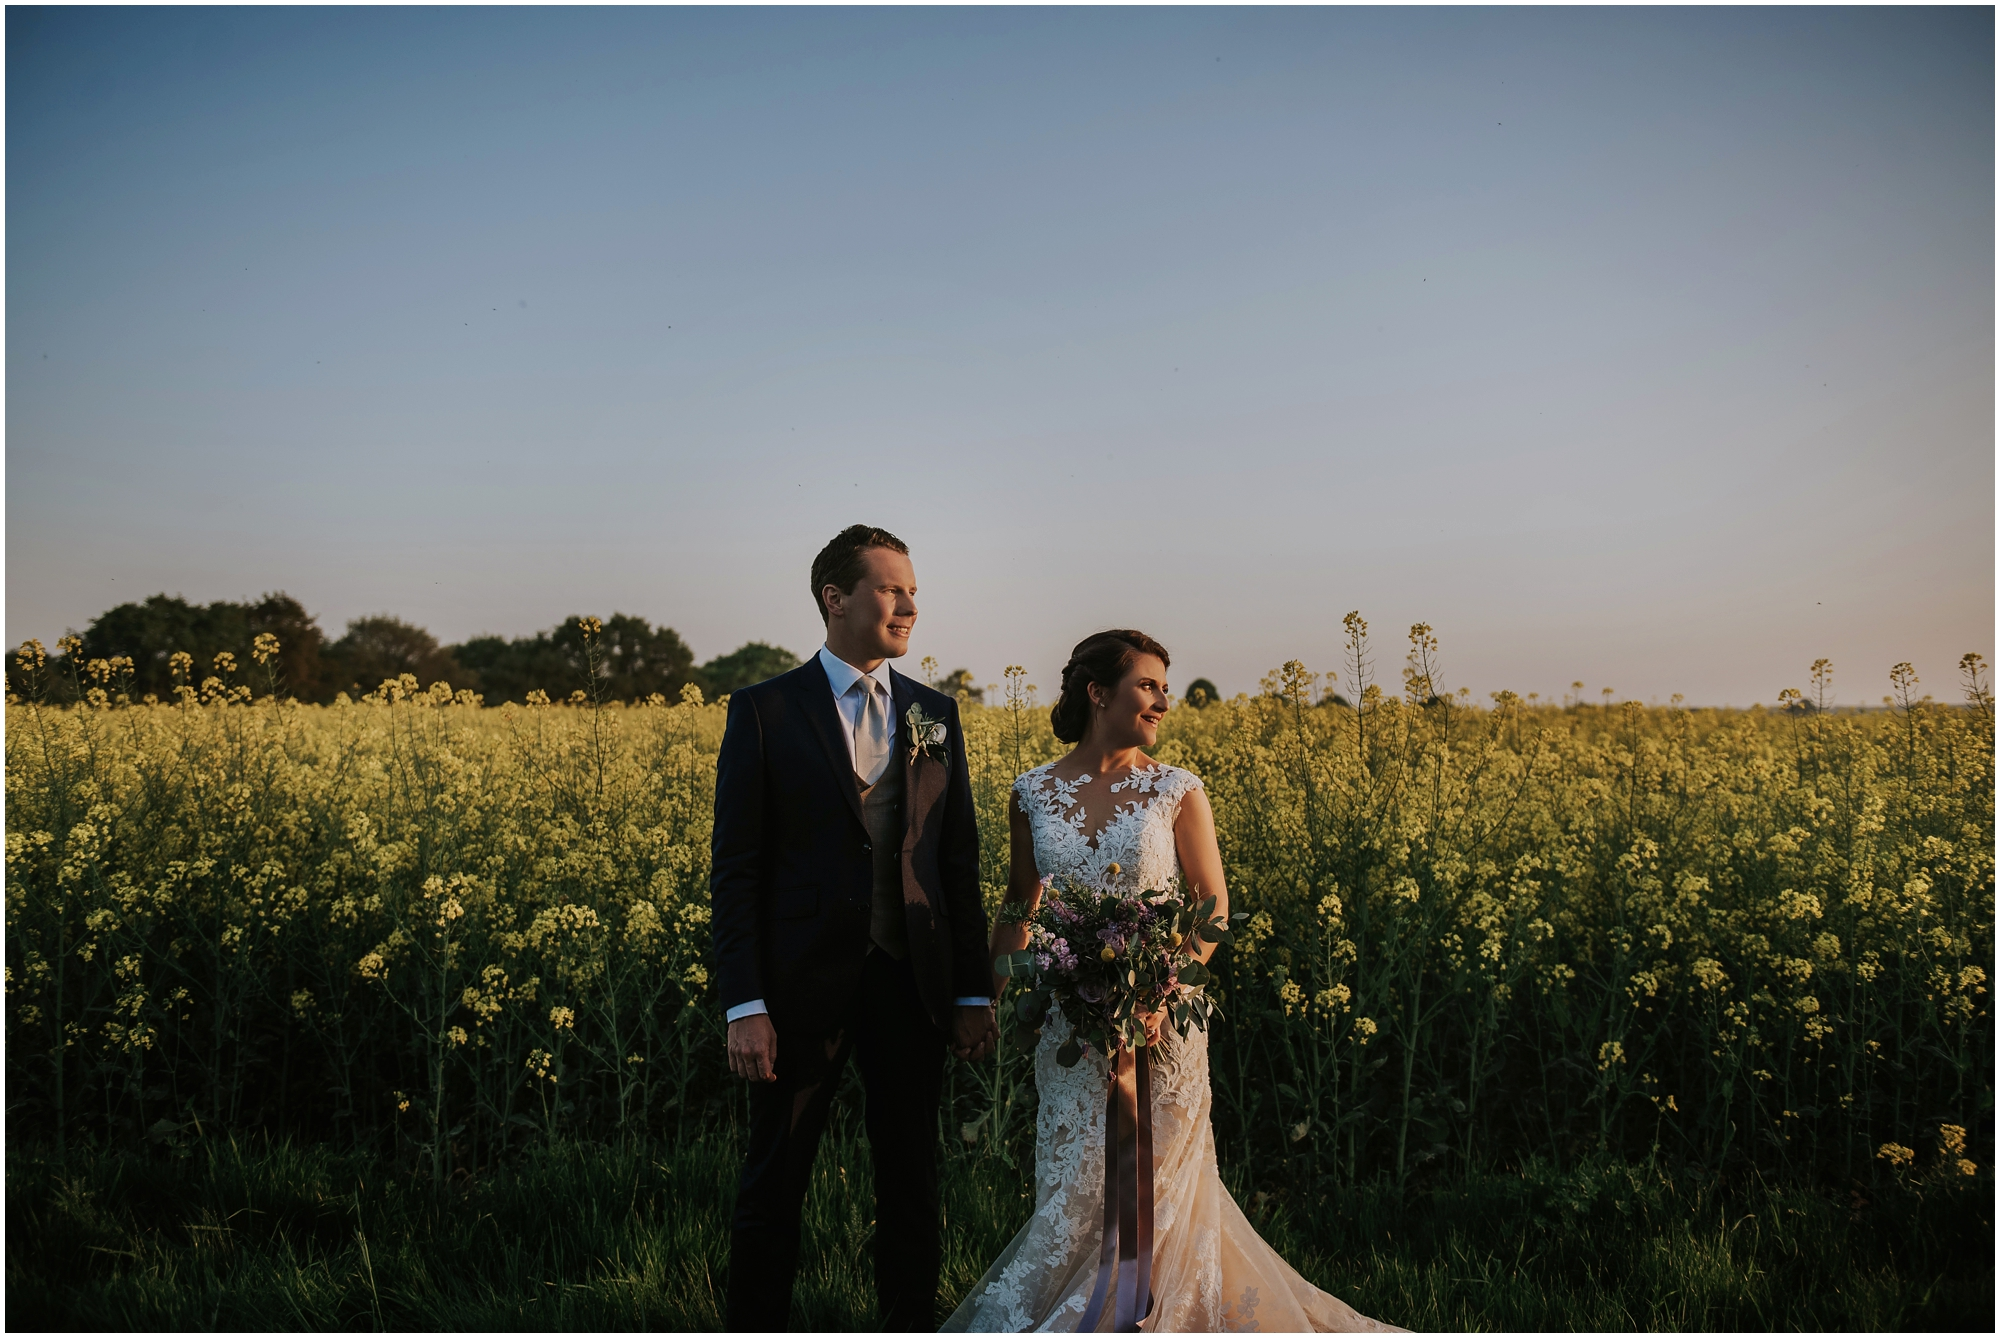 Sopley_Mill_Wedding_SamanthaDavisPhotography027.jpg